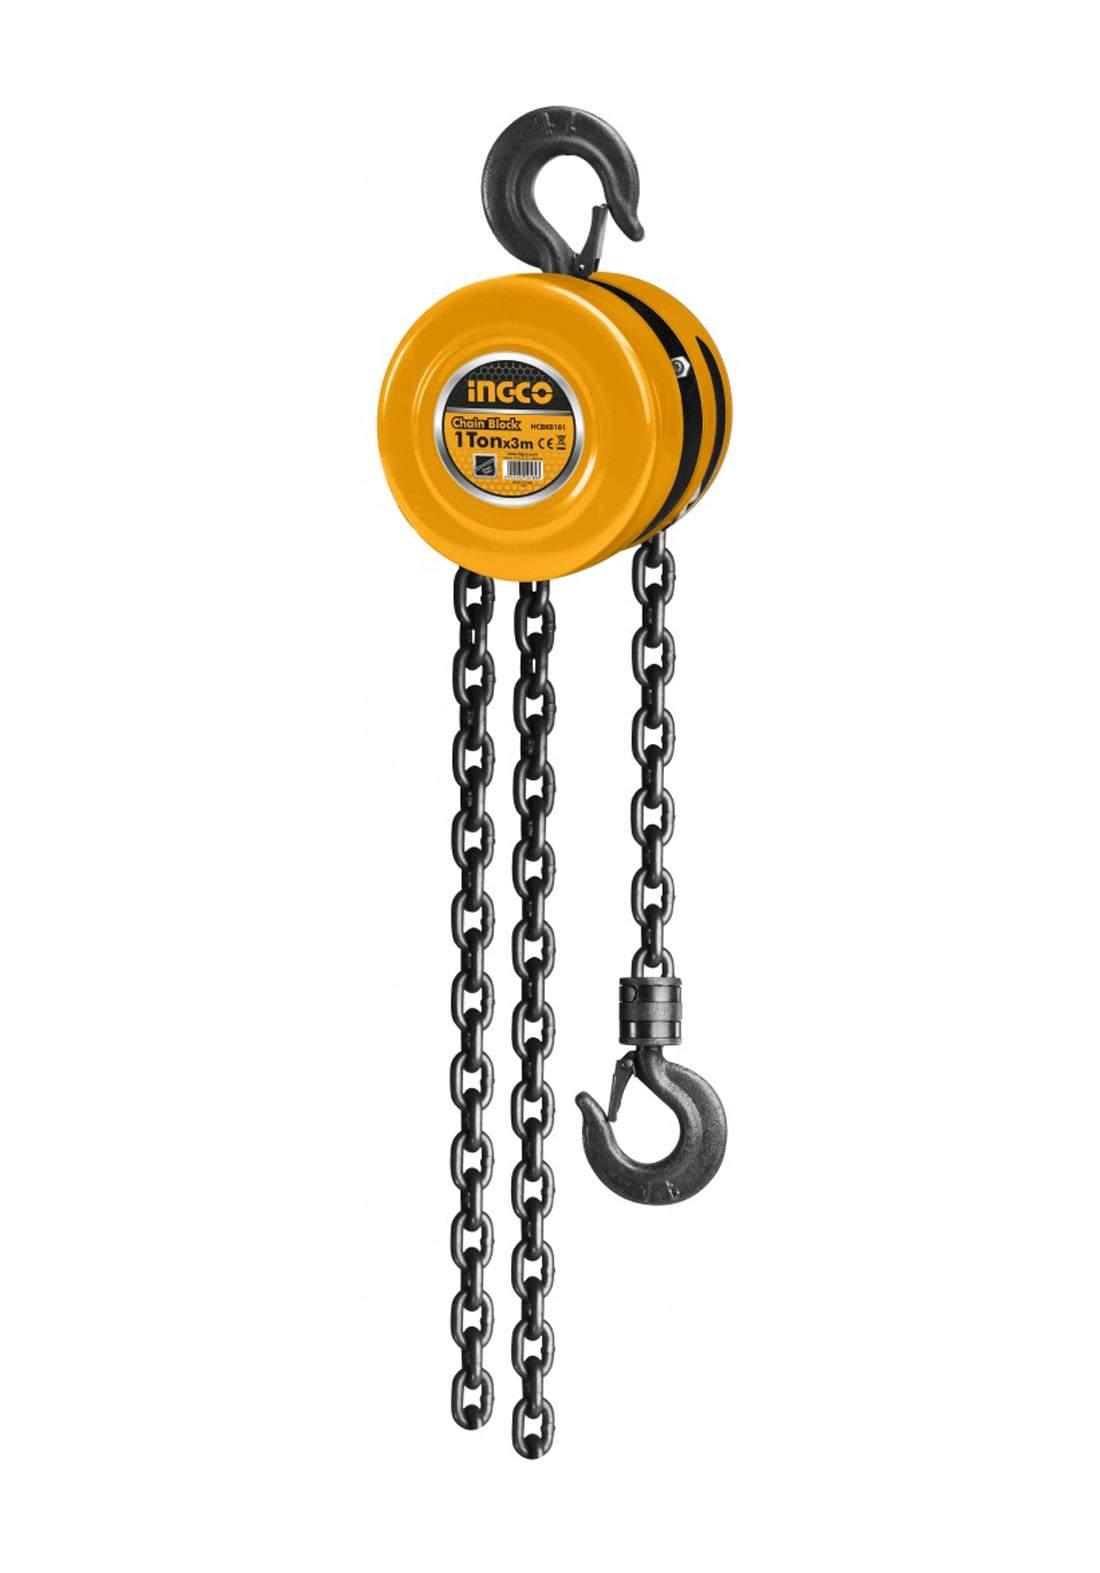 Ingco HCBK0101 Chain Block 1 Ton بكرة سحب